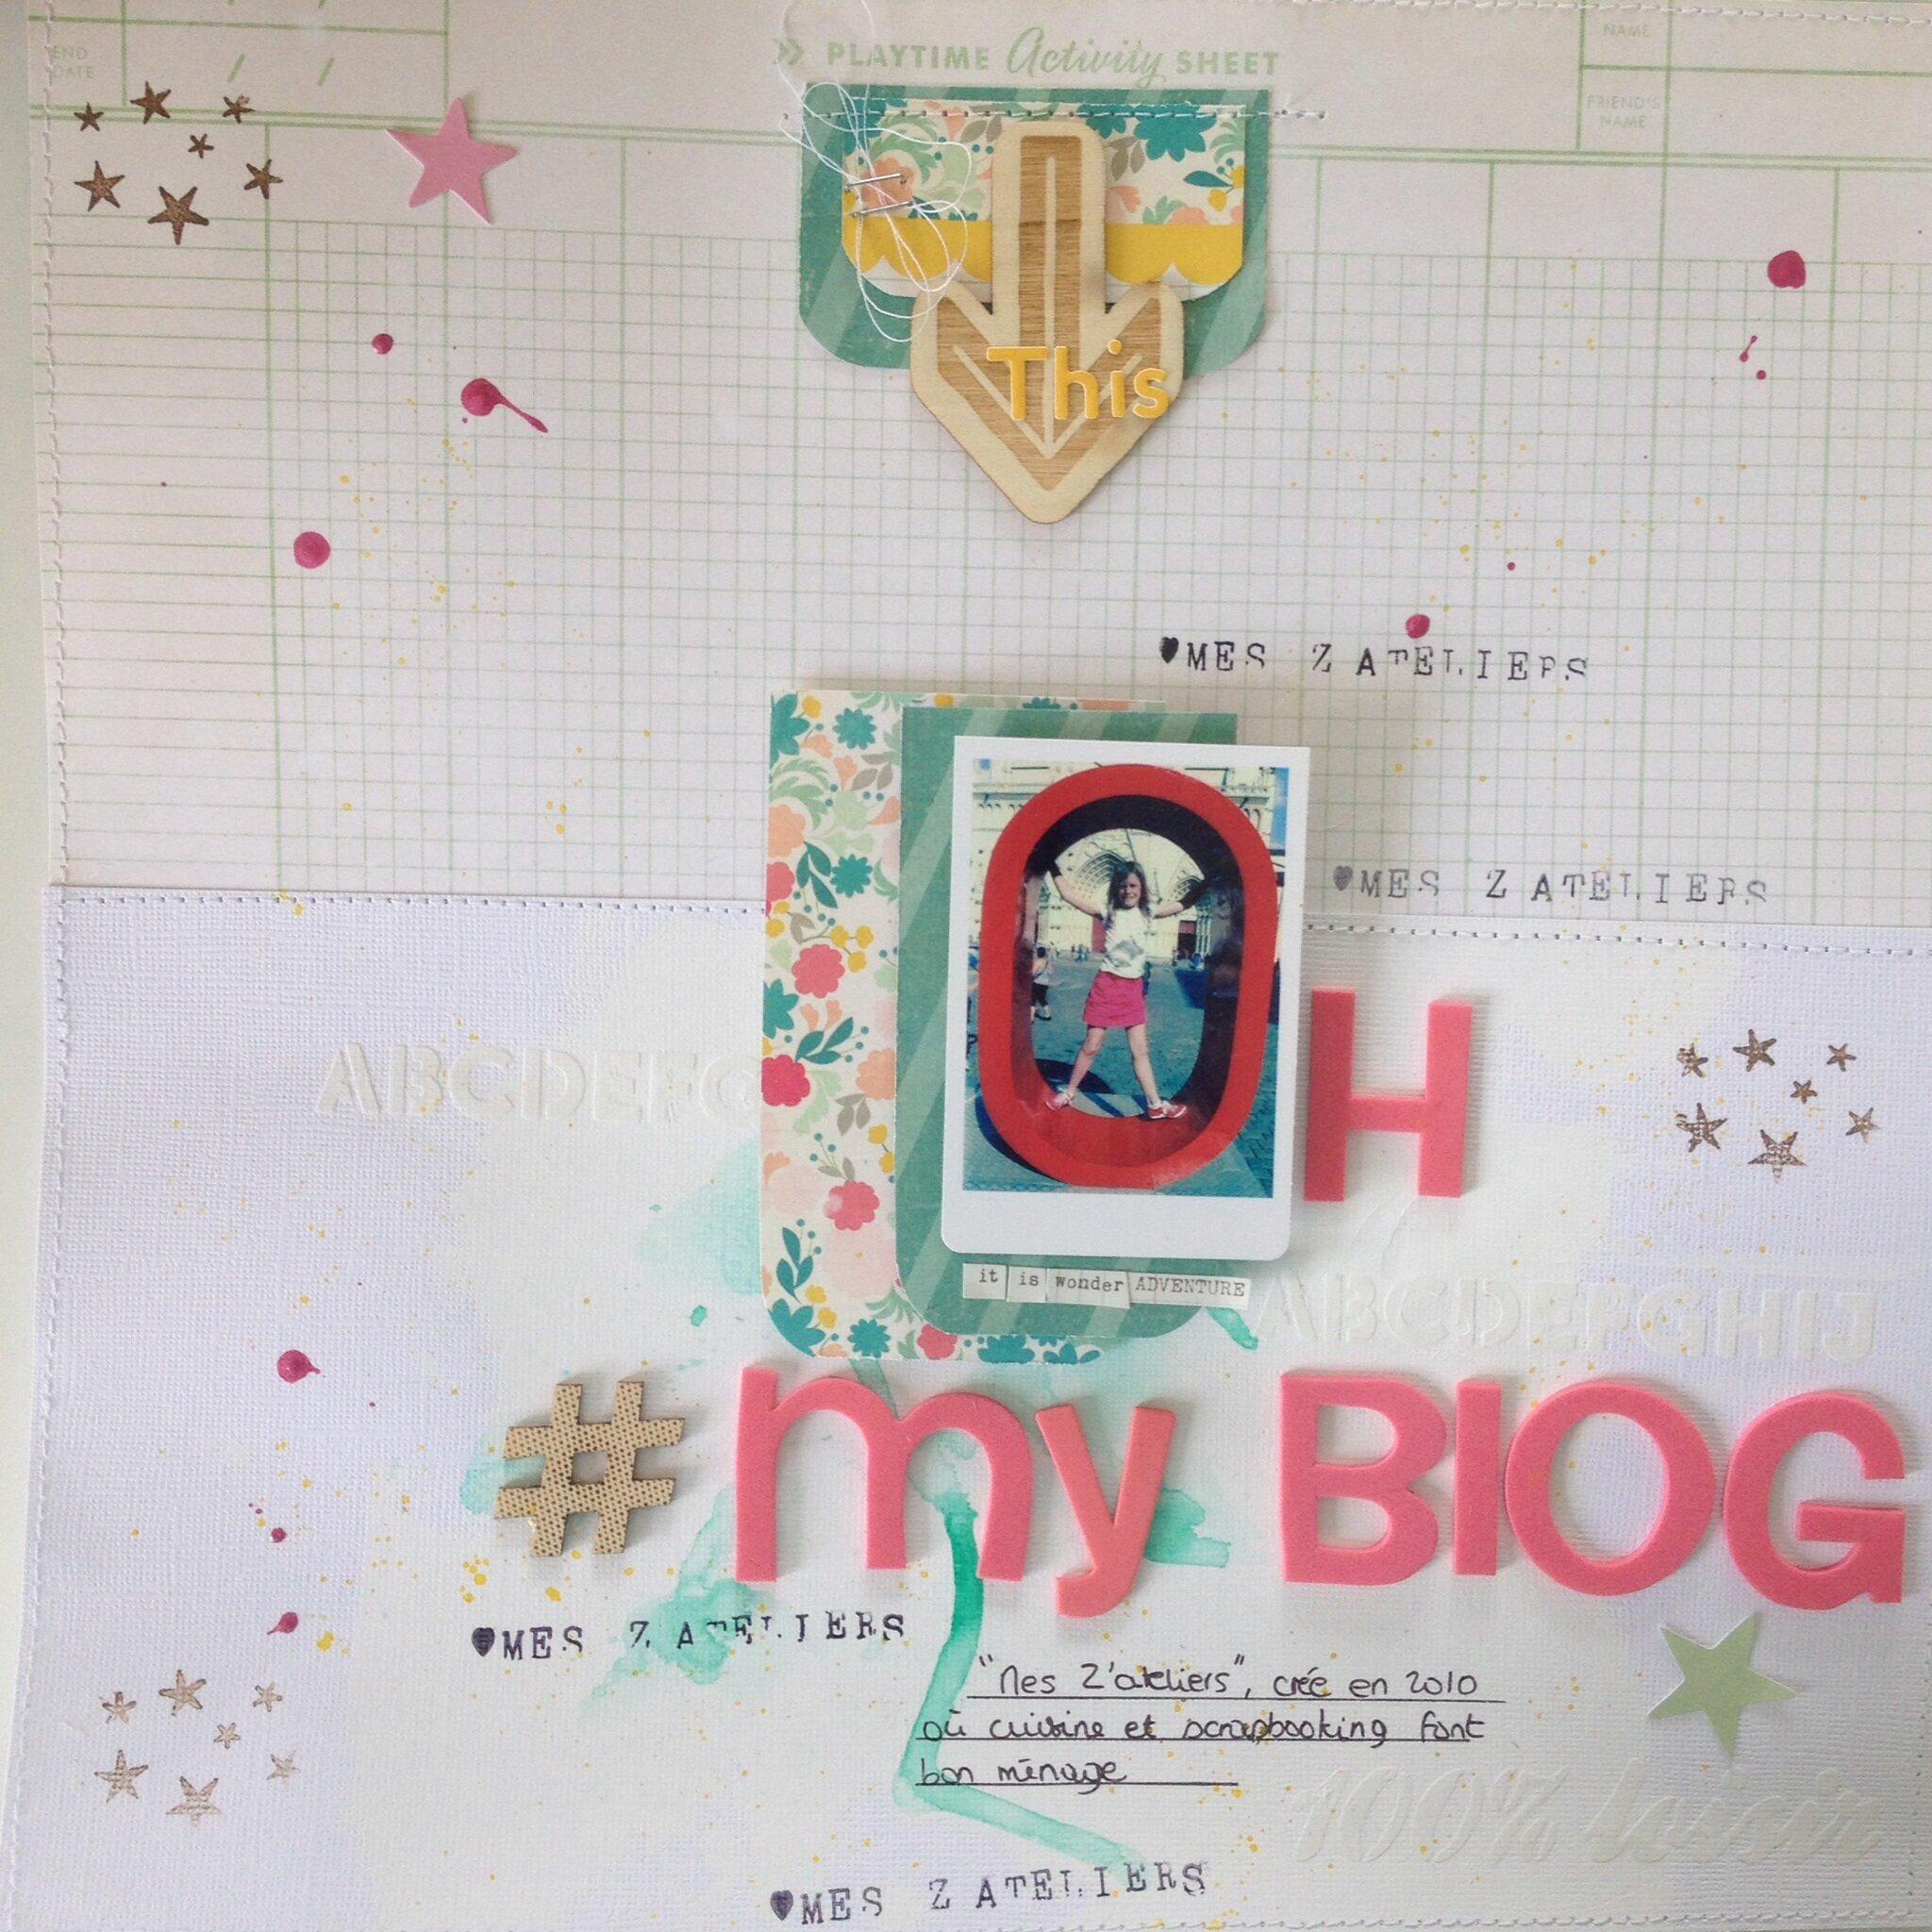 #Oh my blog